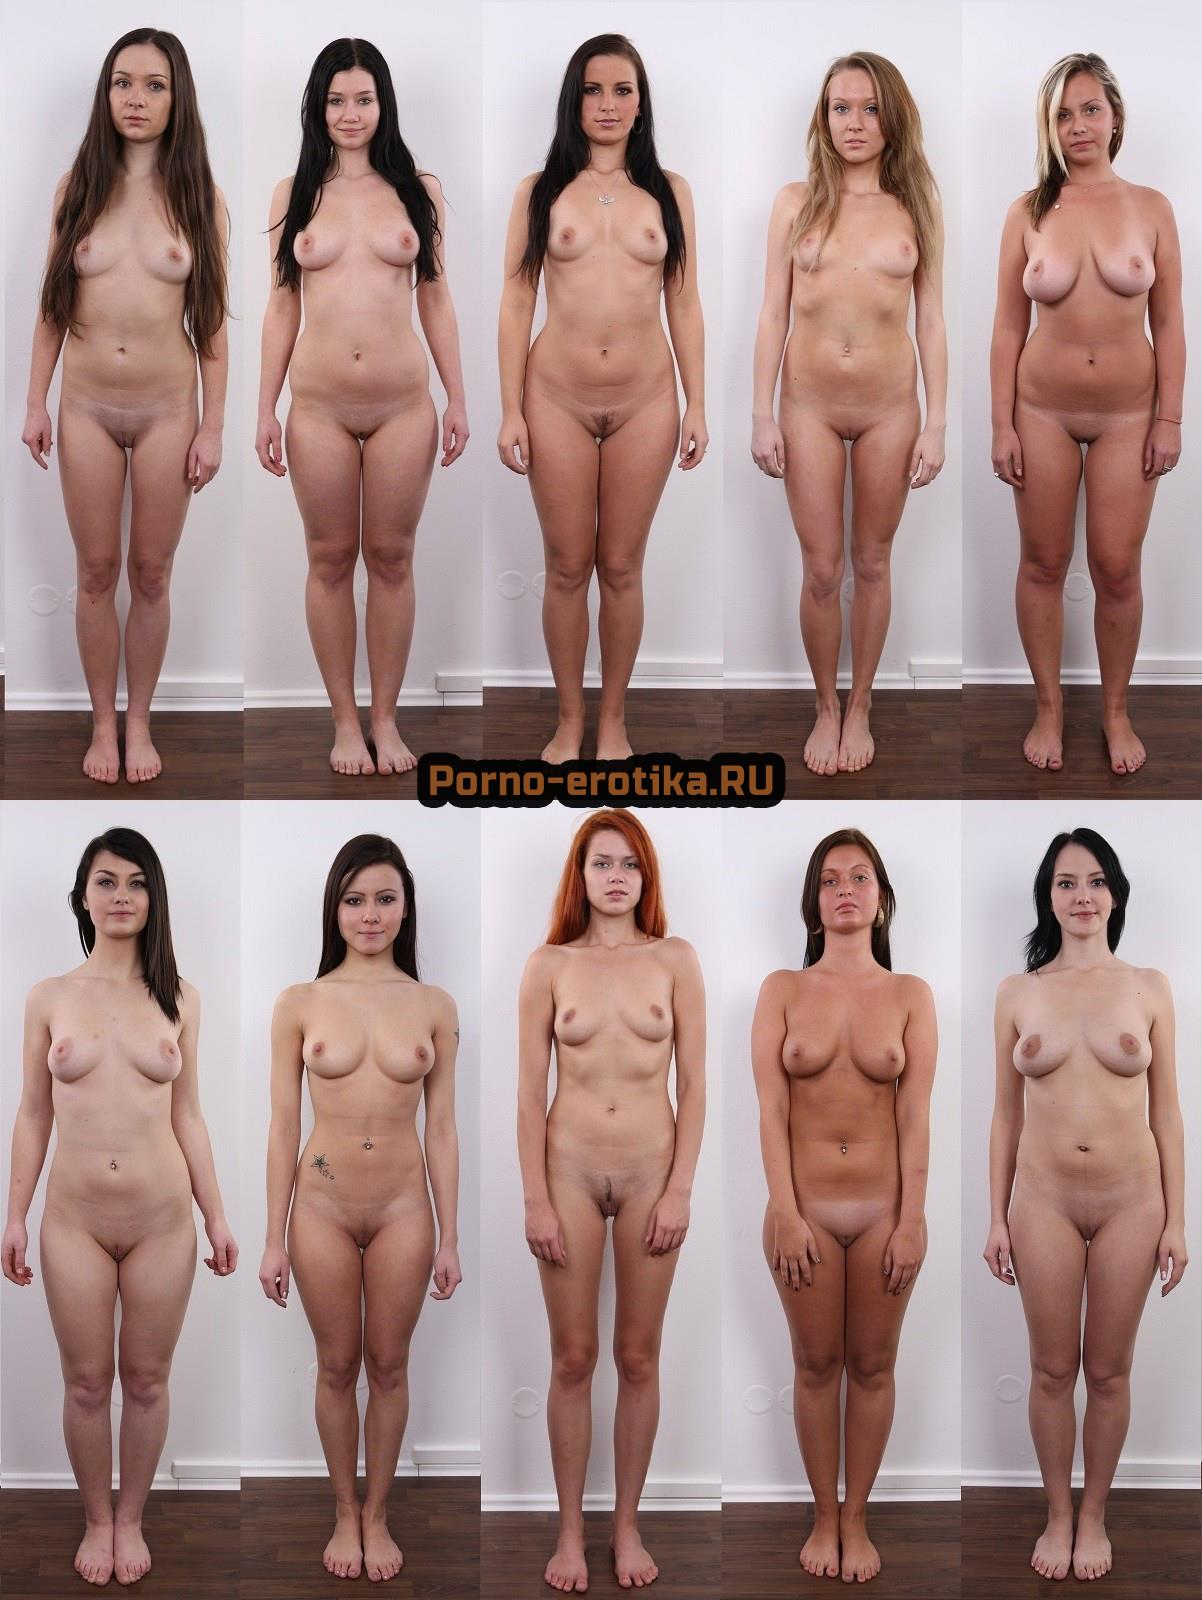 Порно кастинг с моделями фото 283-739